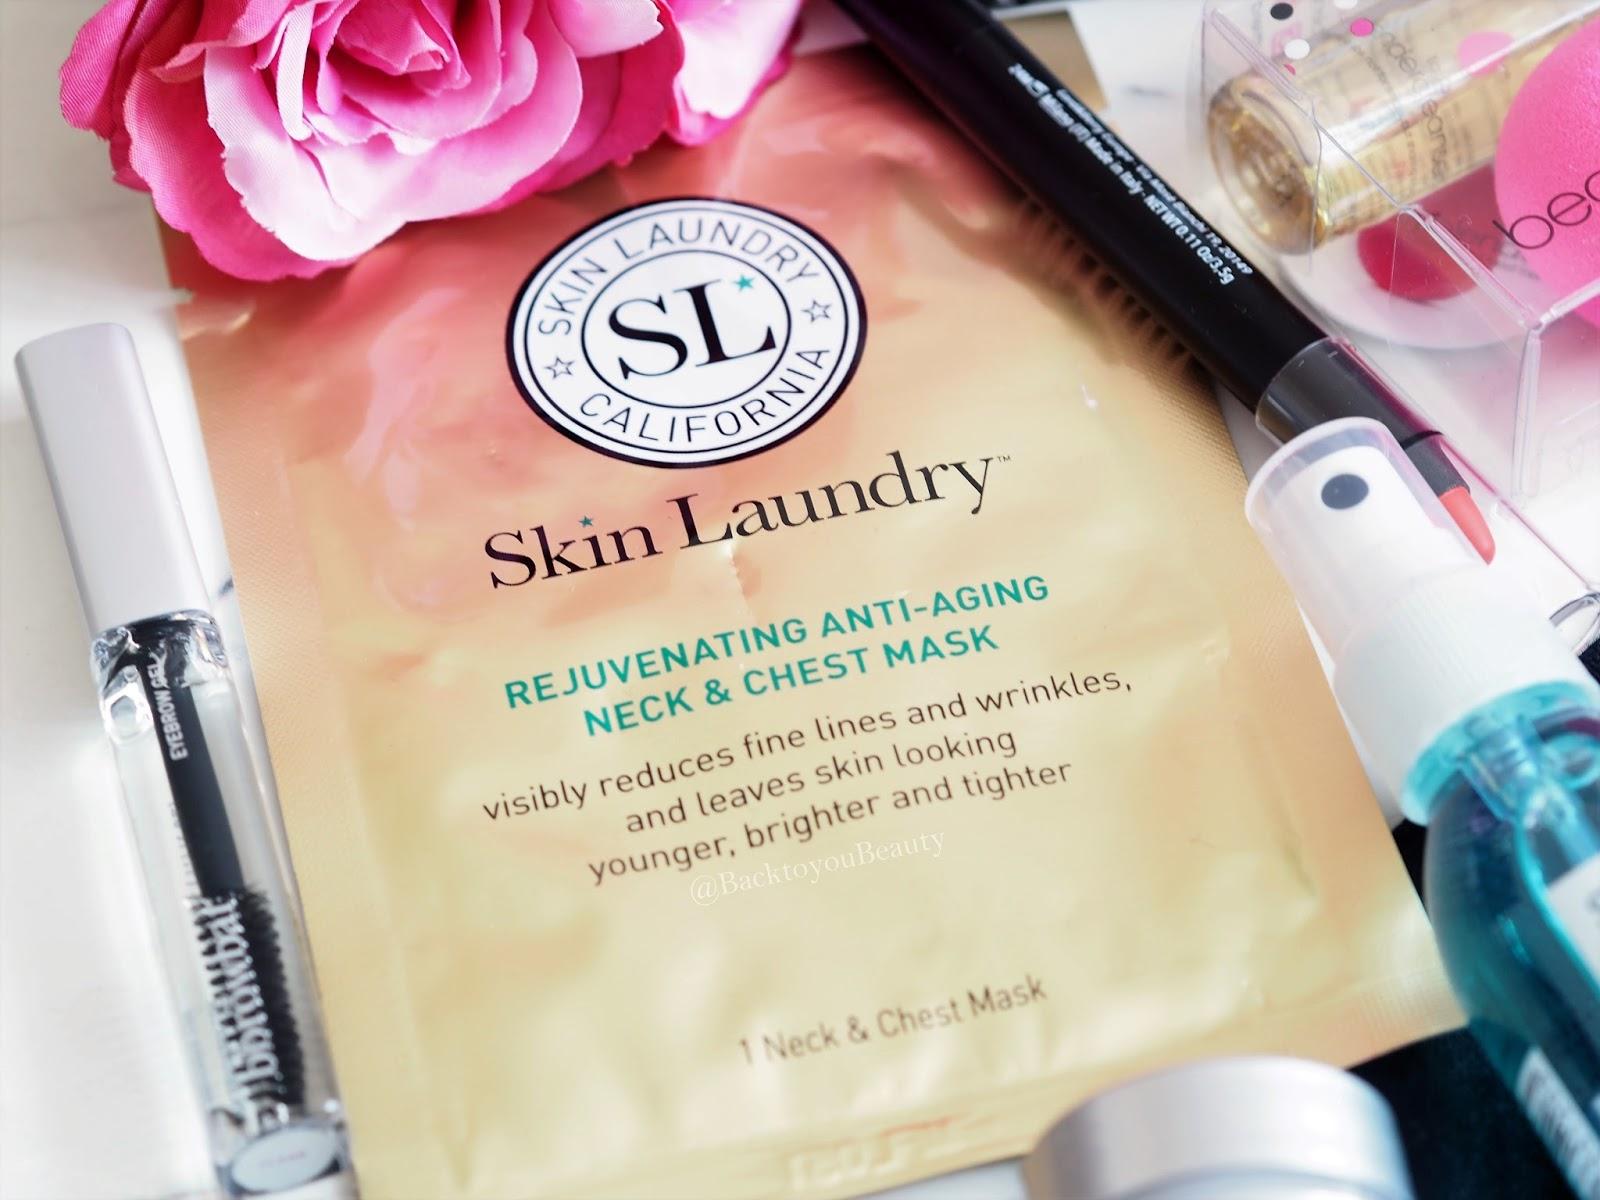 Skin Laundrey at Indulge Beauty